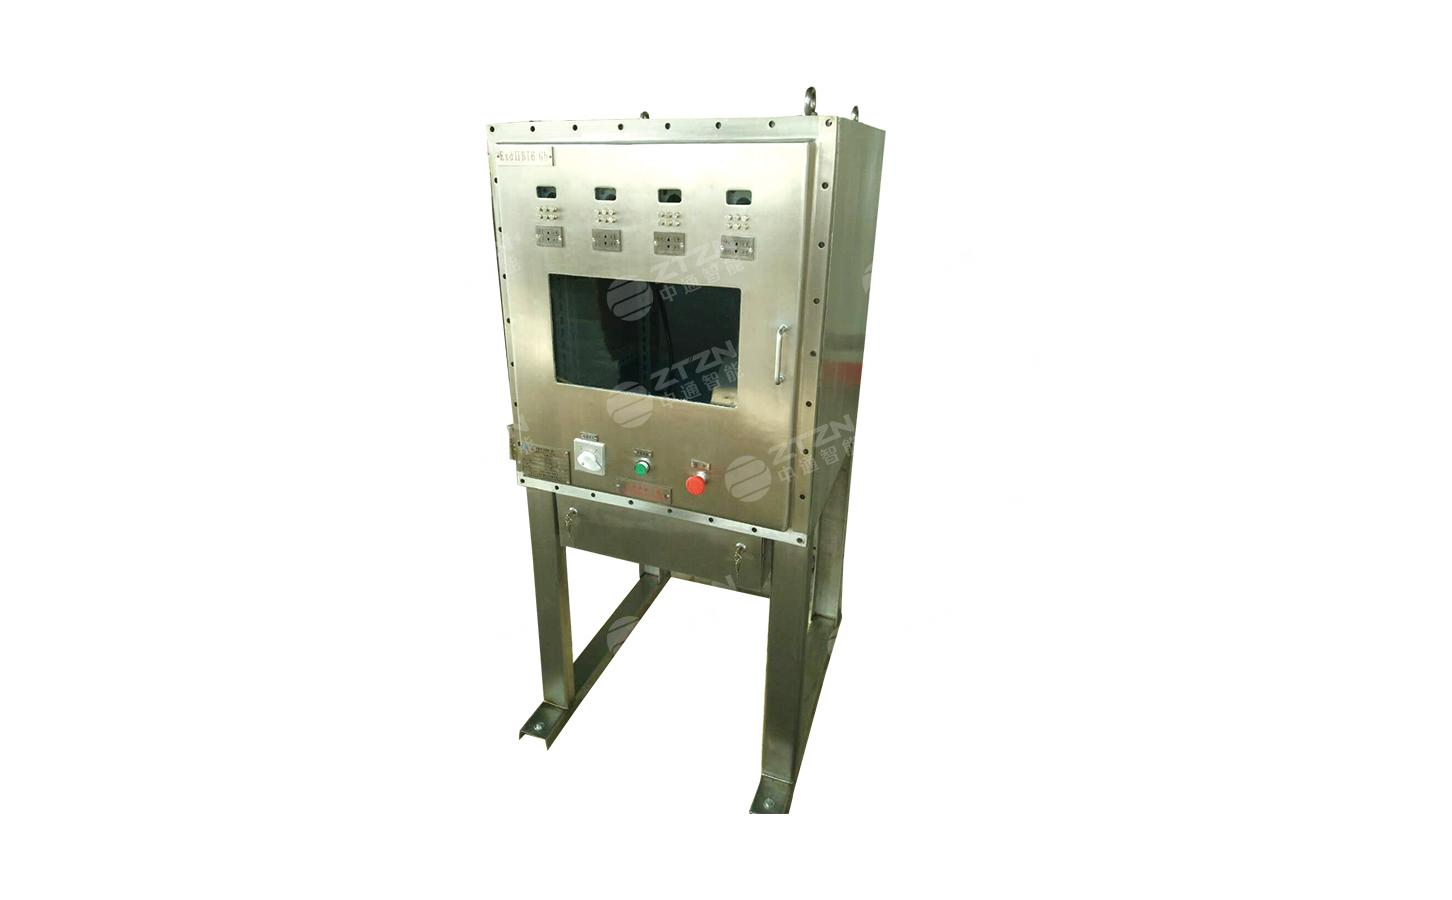 BXK51防爆电气控制柜(带电脑),BXK51防爆电气控制柜(带电脑)价格,BXK51防爆电气控制柜(带电脑)厂家